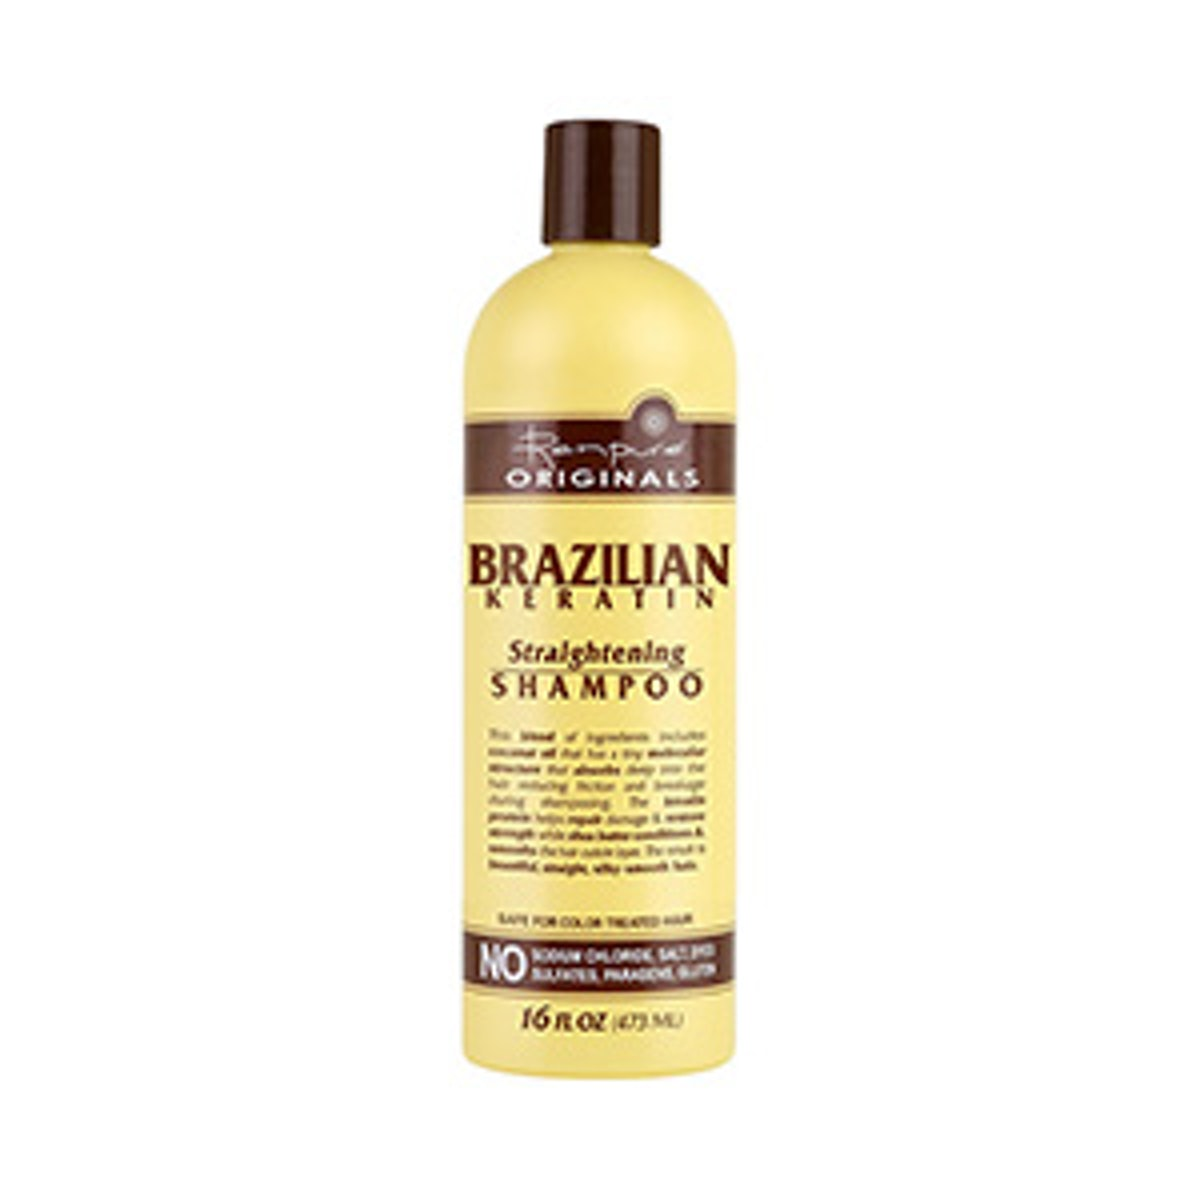 Brazilian Keratin Straightening Shampoo